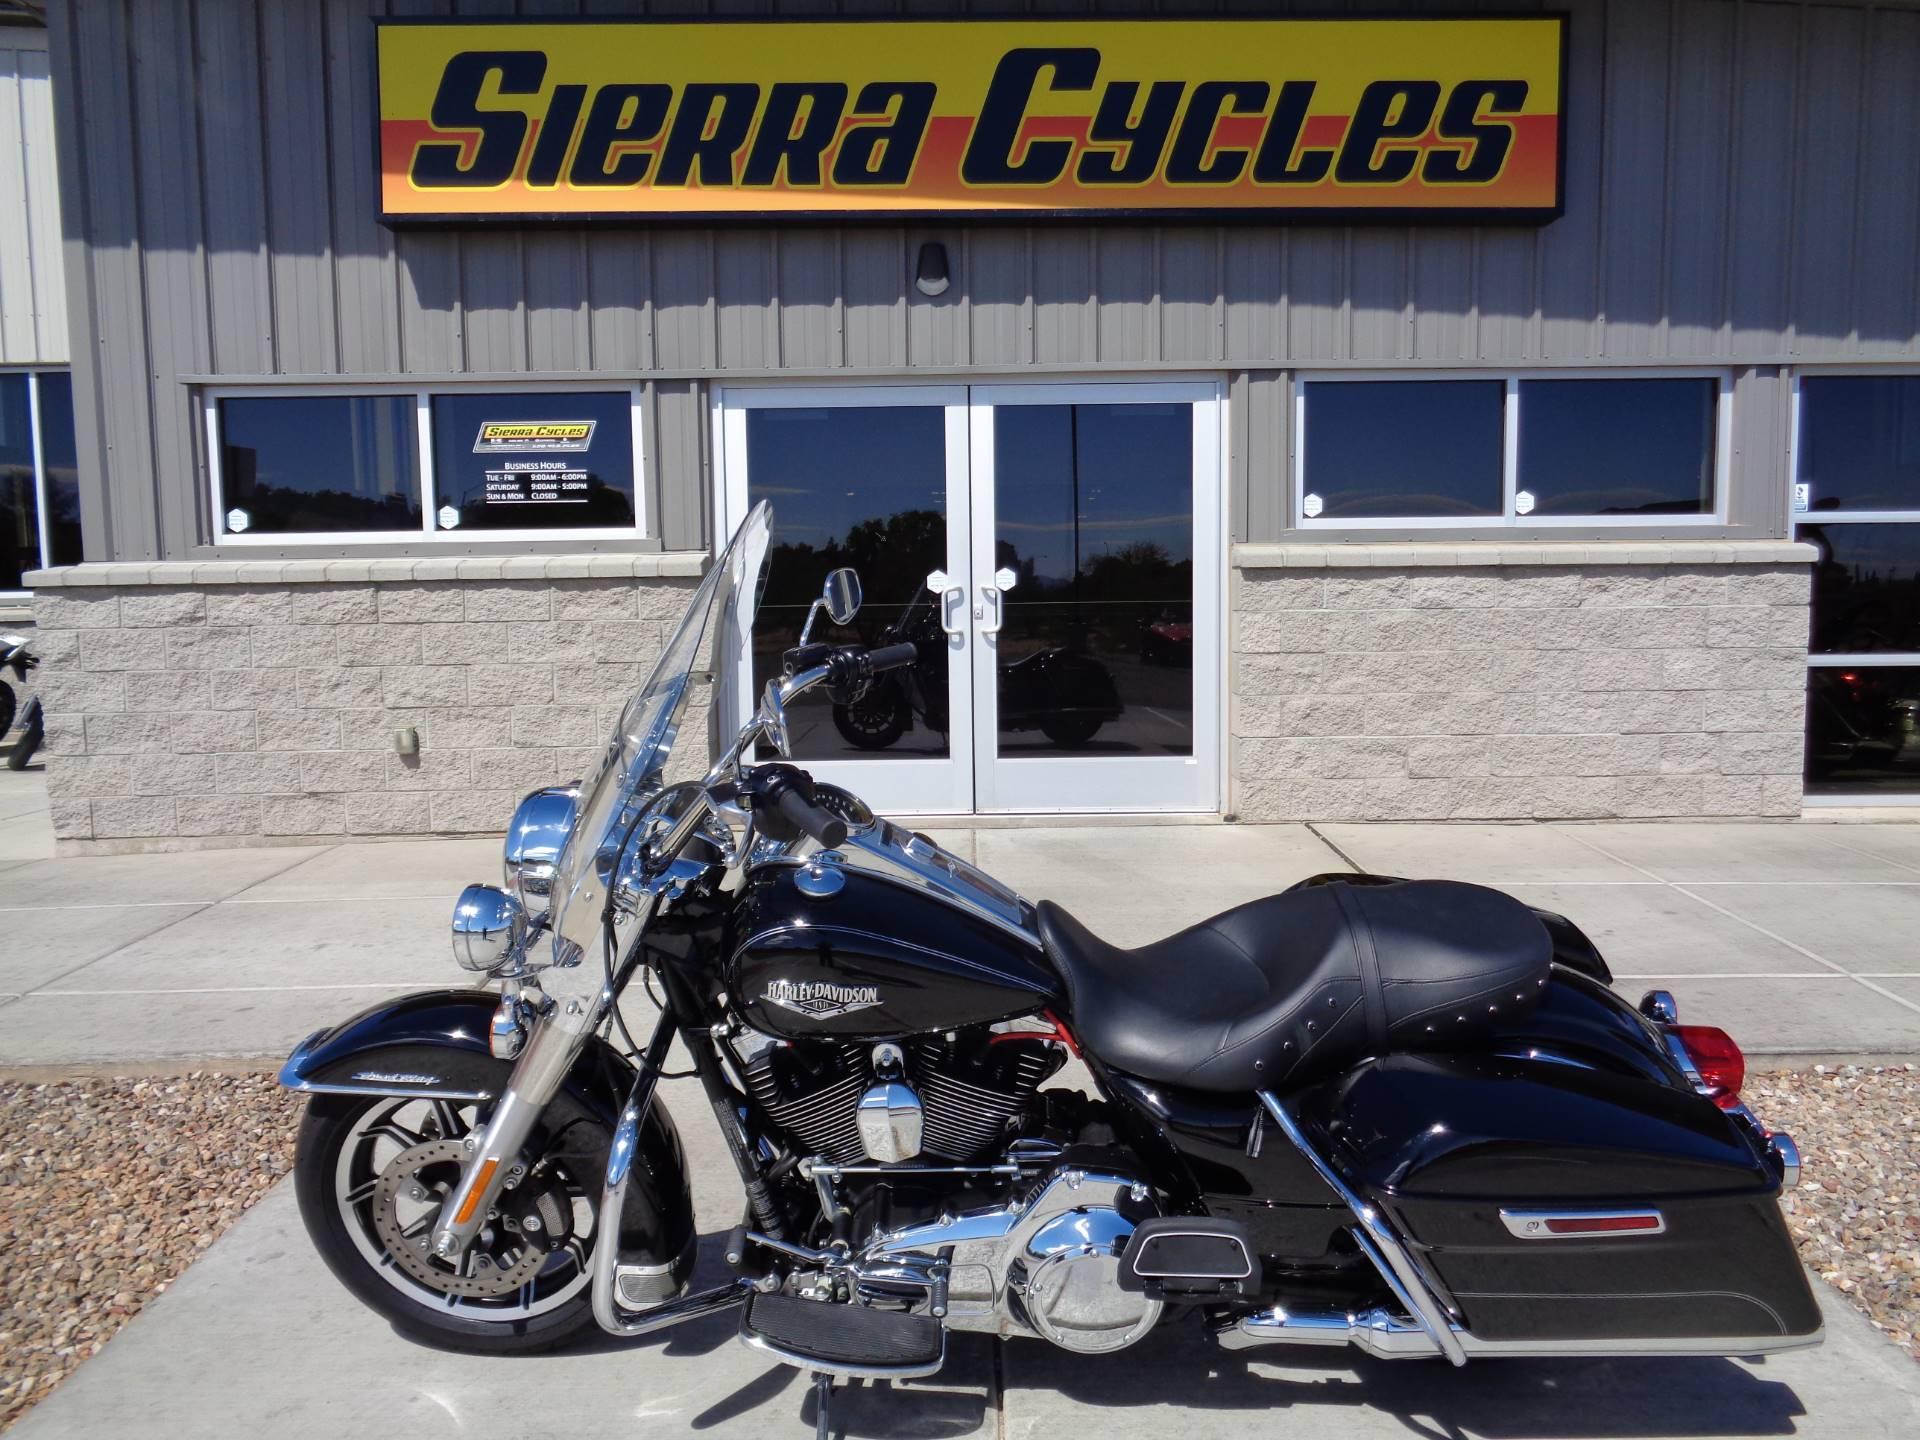 2016 Harley Davidson Road King In Sierra Vista Arizona